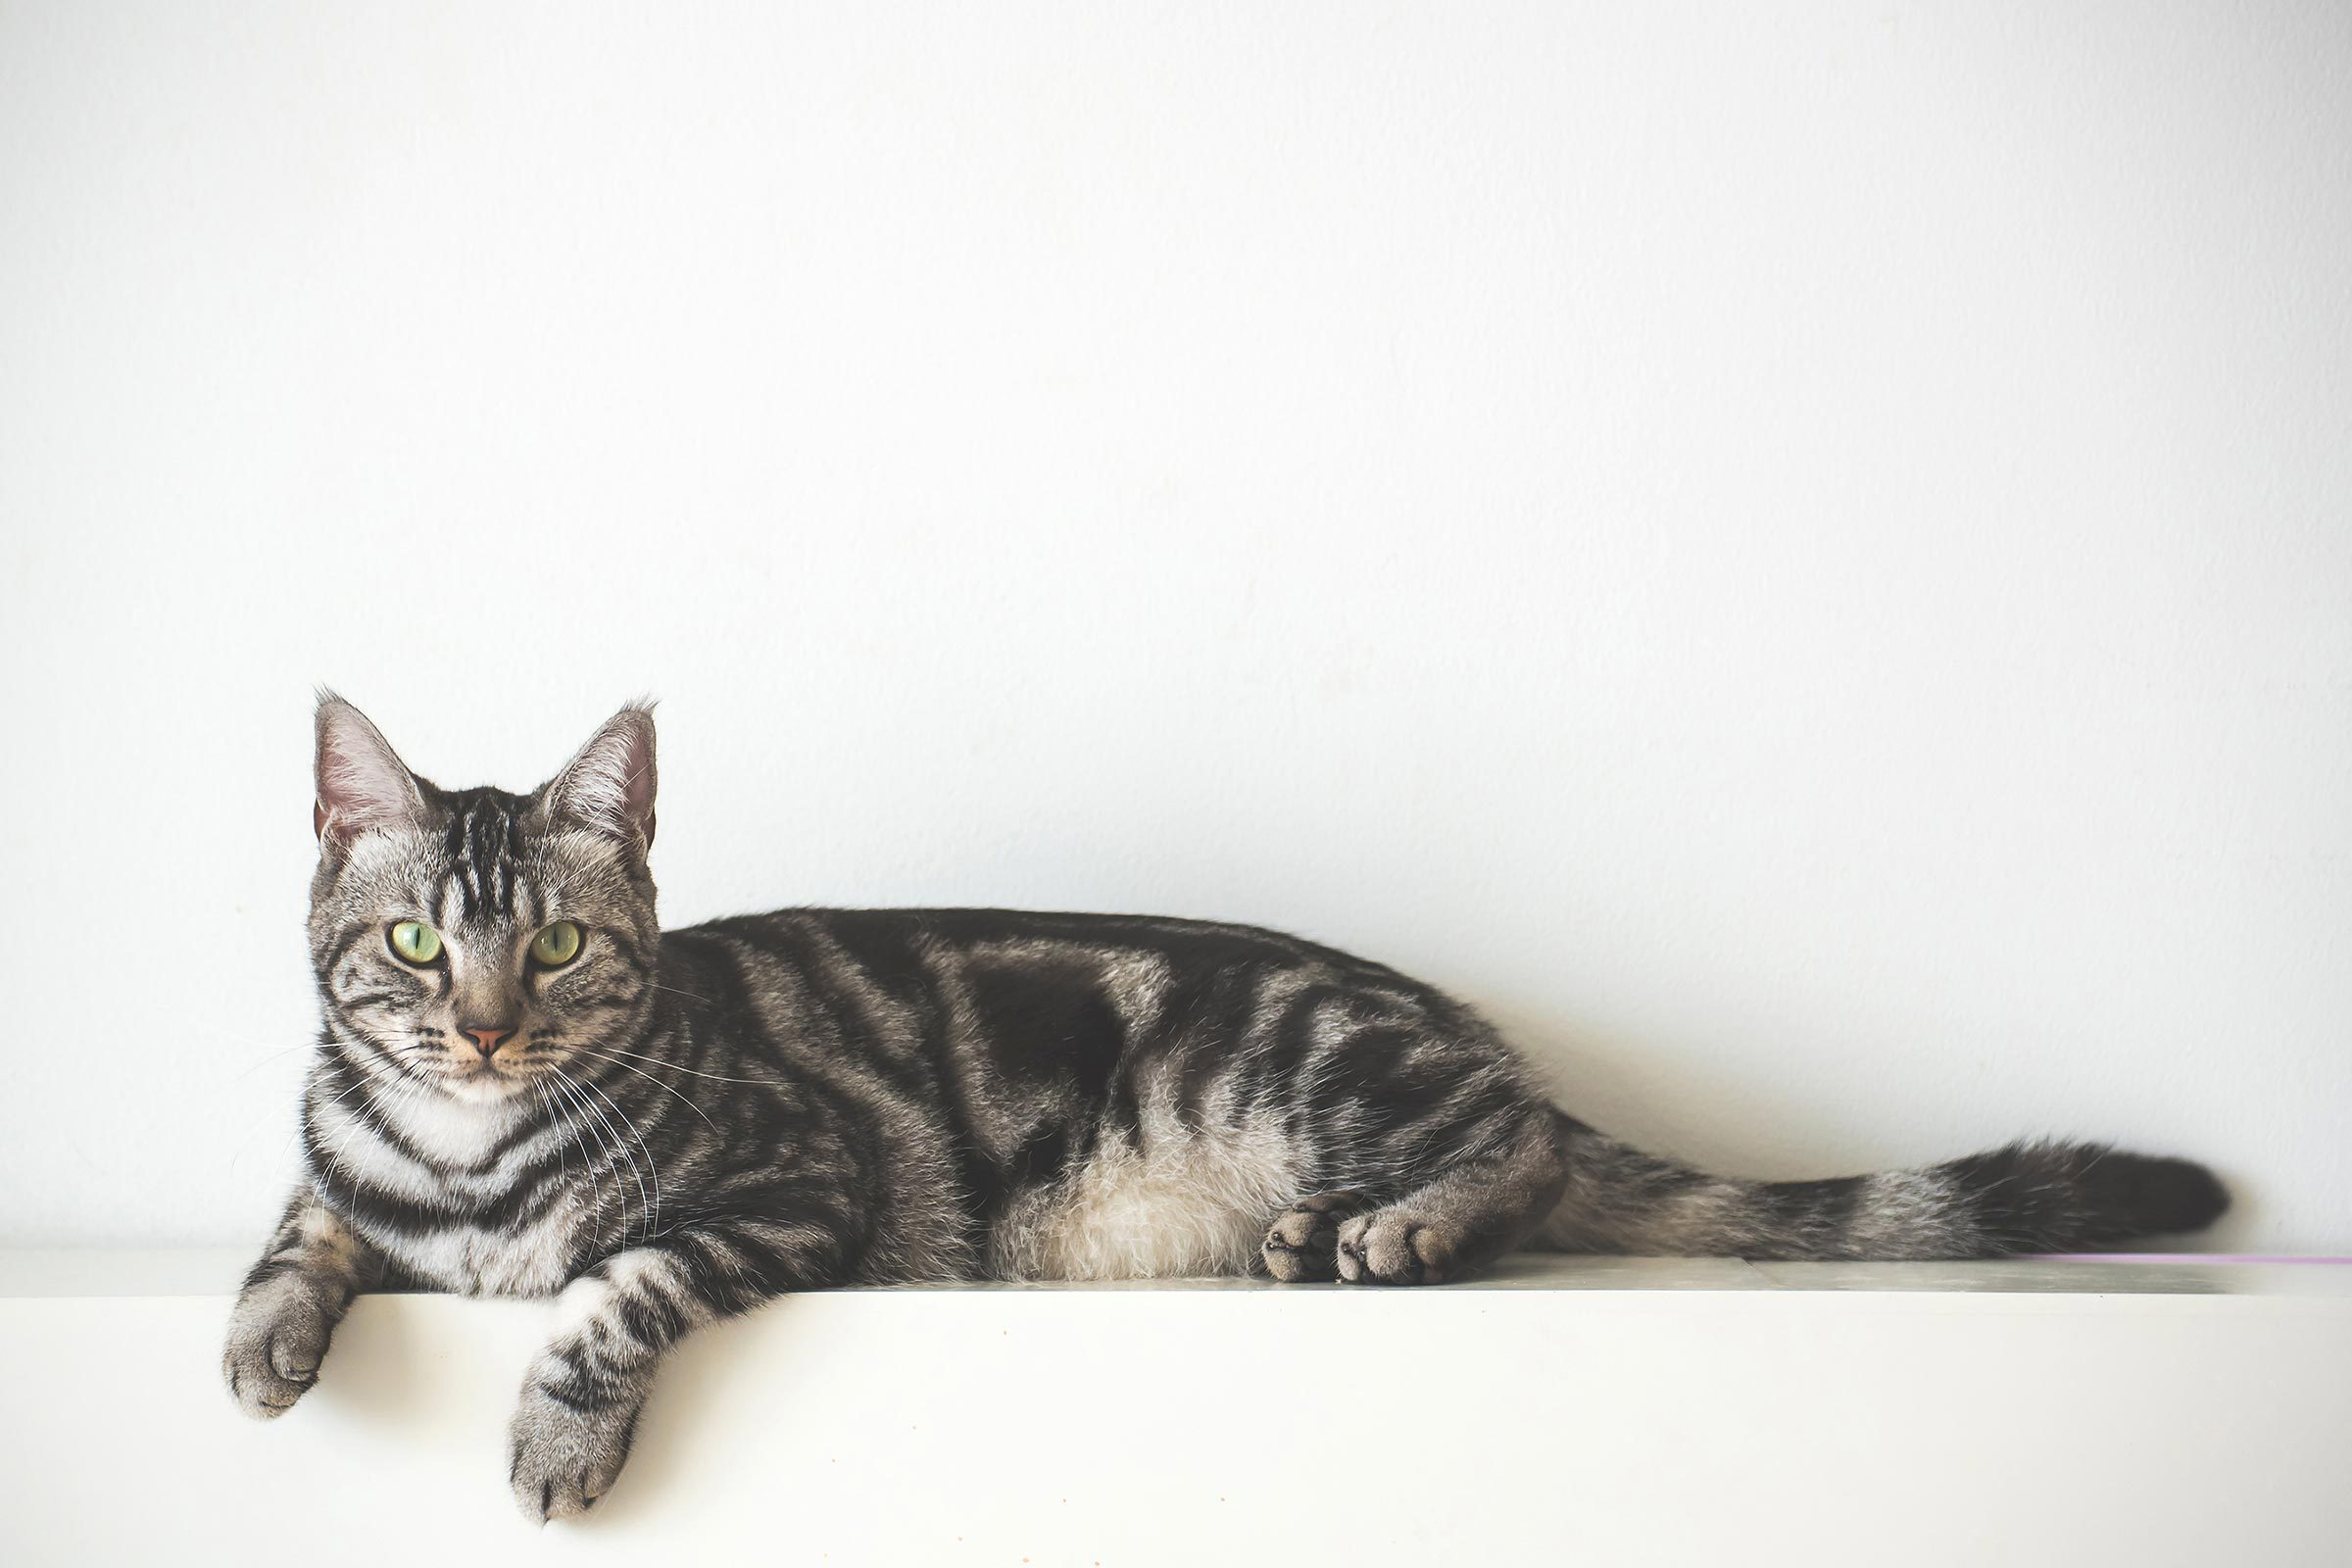 cat lying on heater